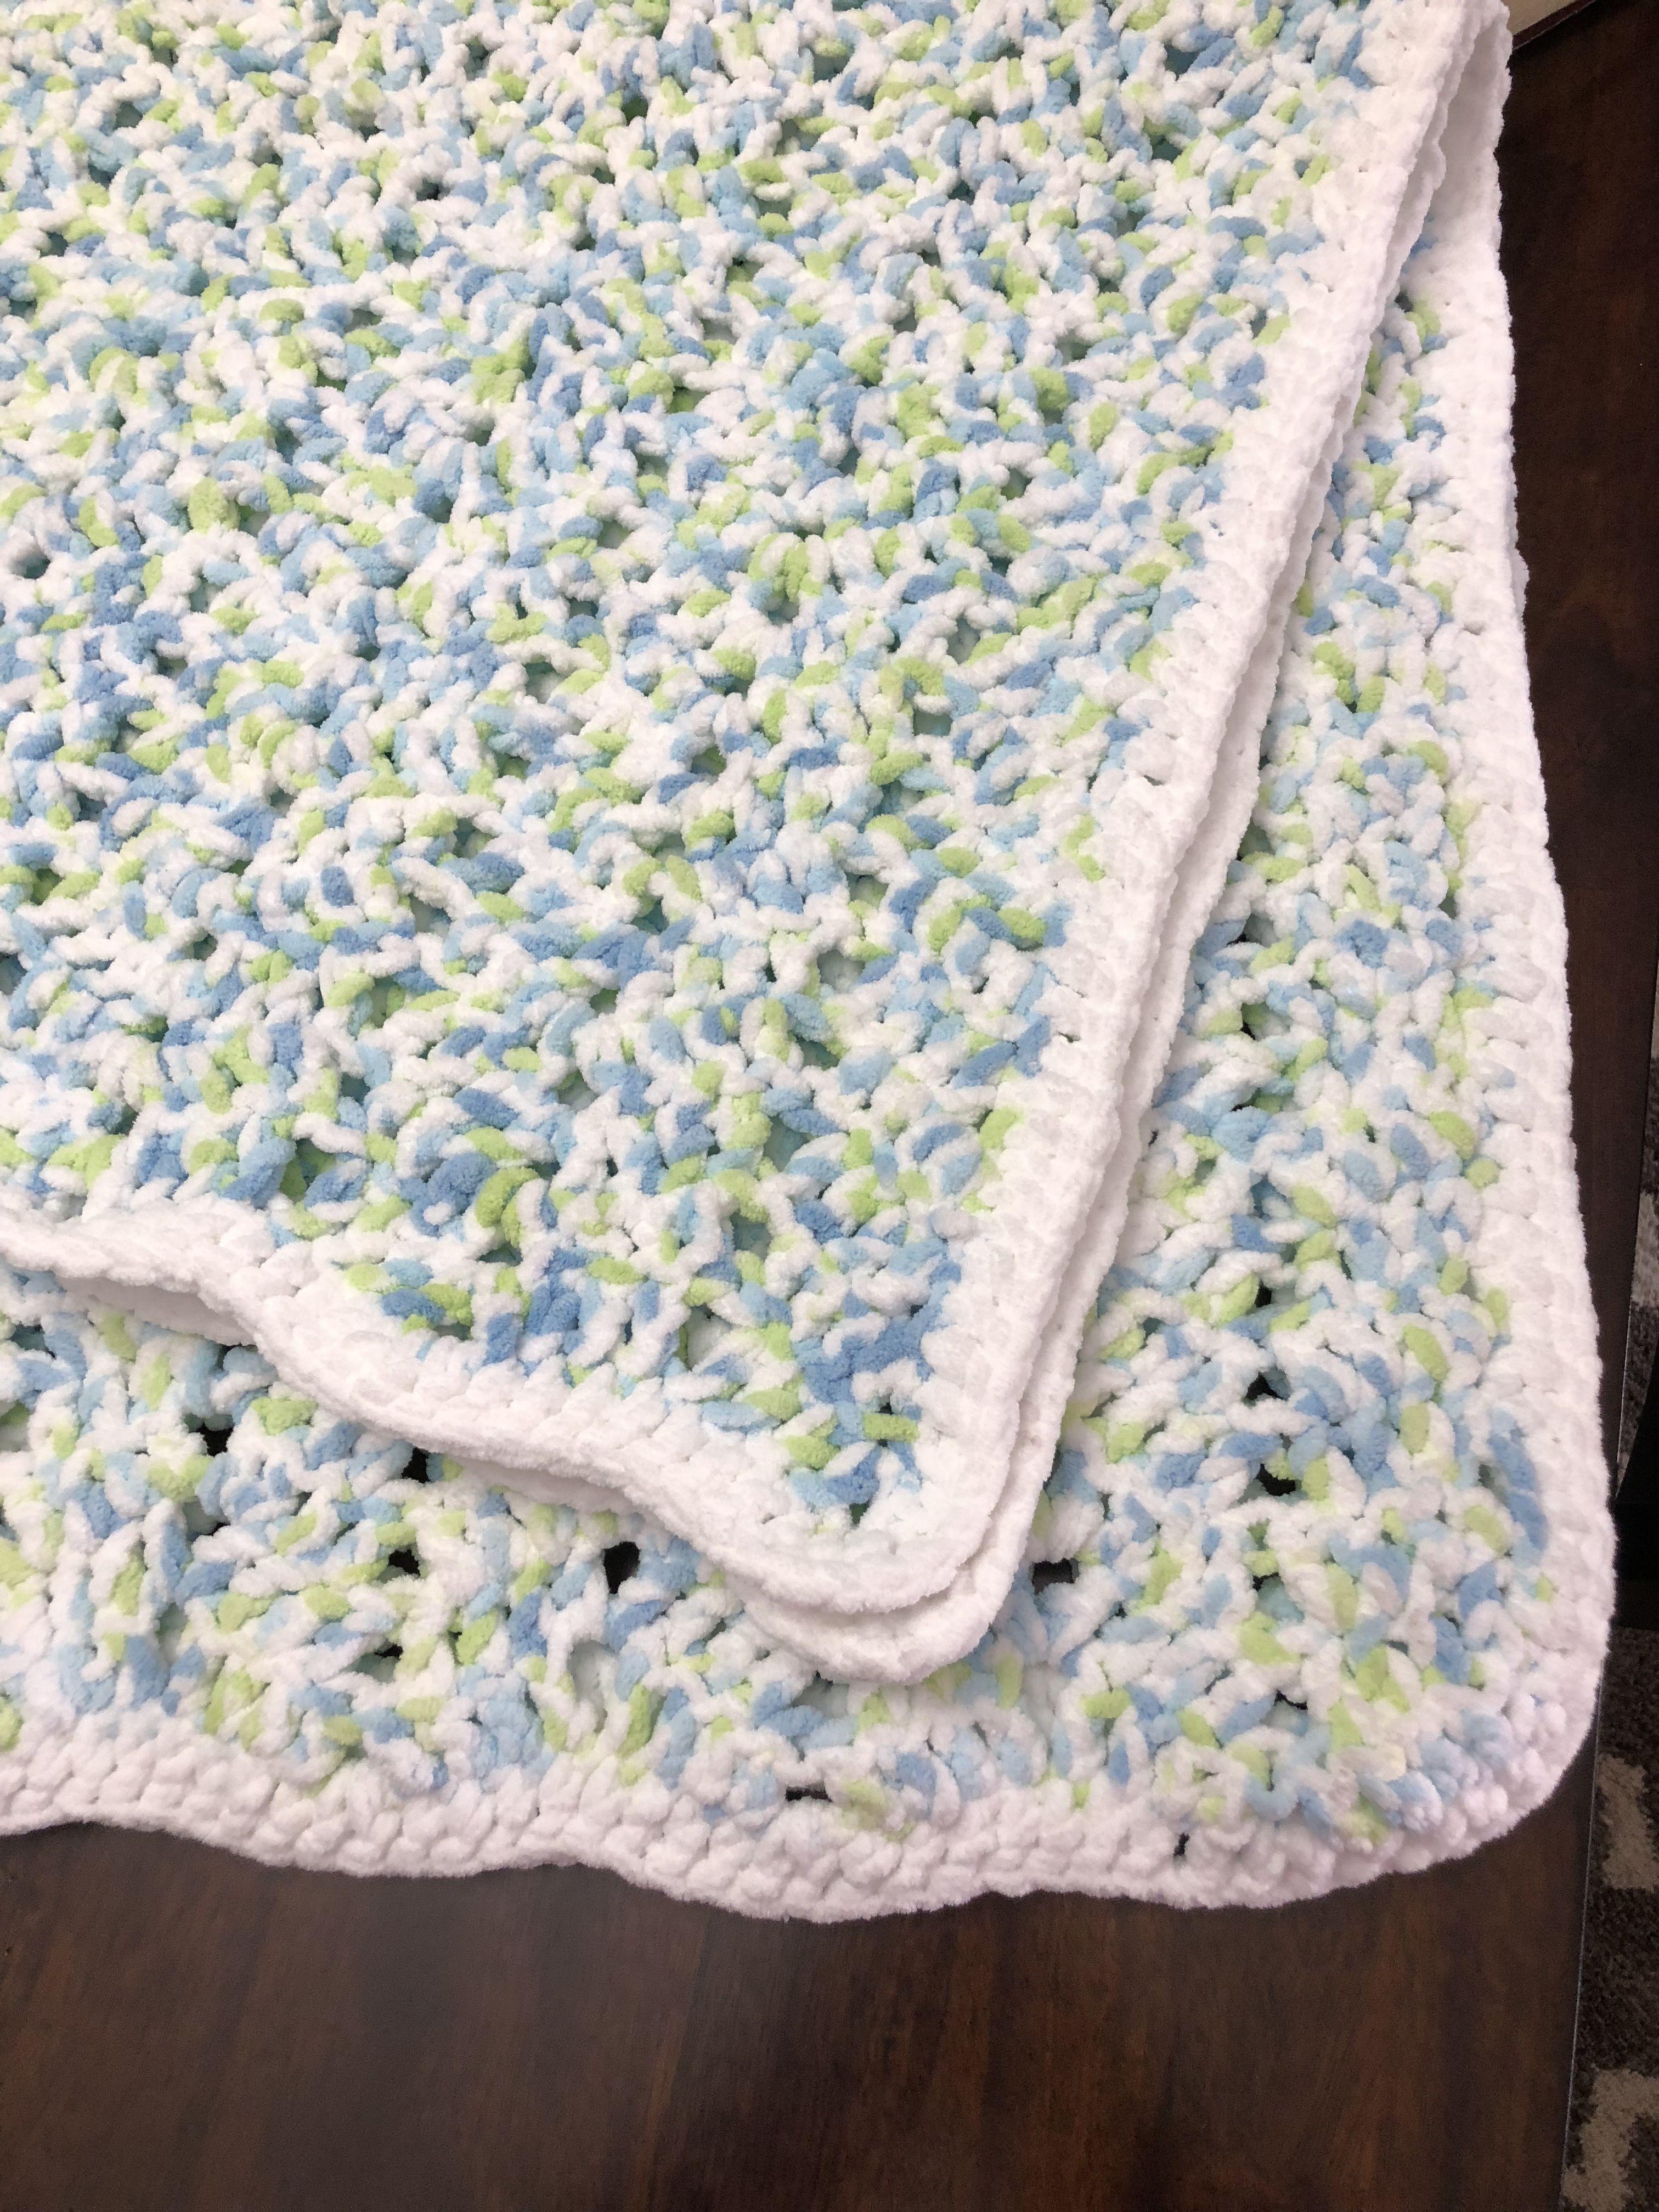 DONE - Bernat Baby Blanket yarn from makeanddocrew com/free-modern